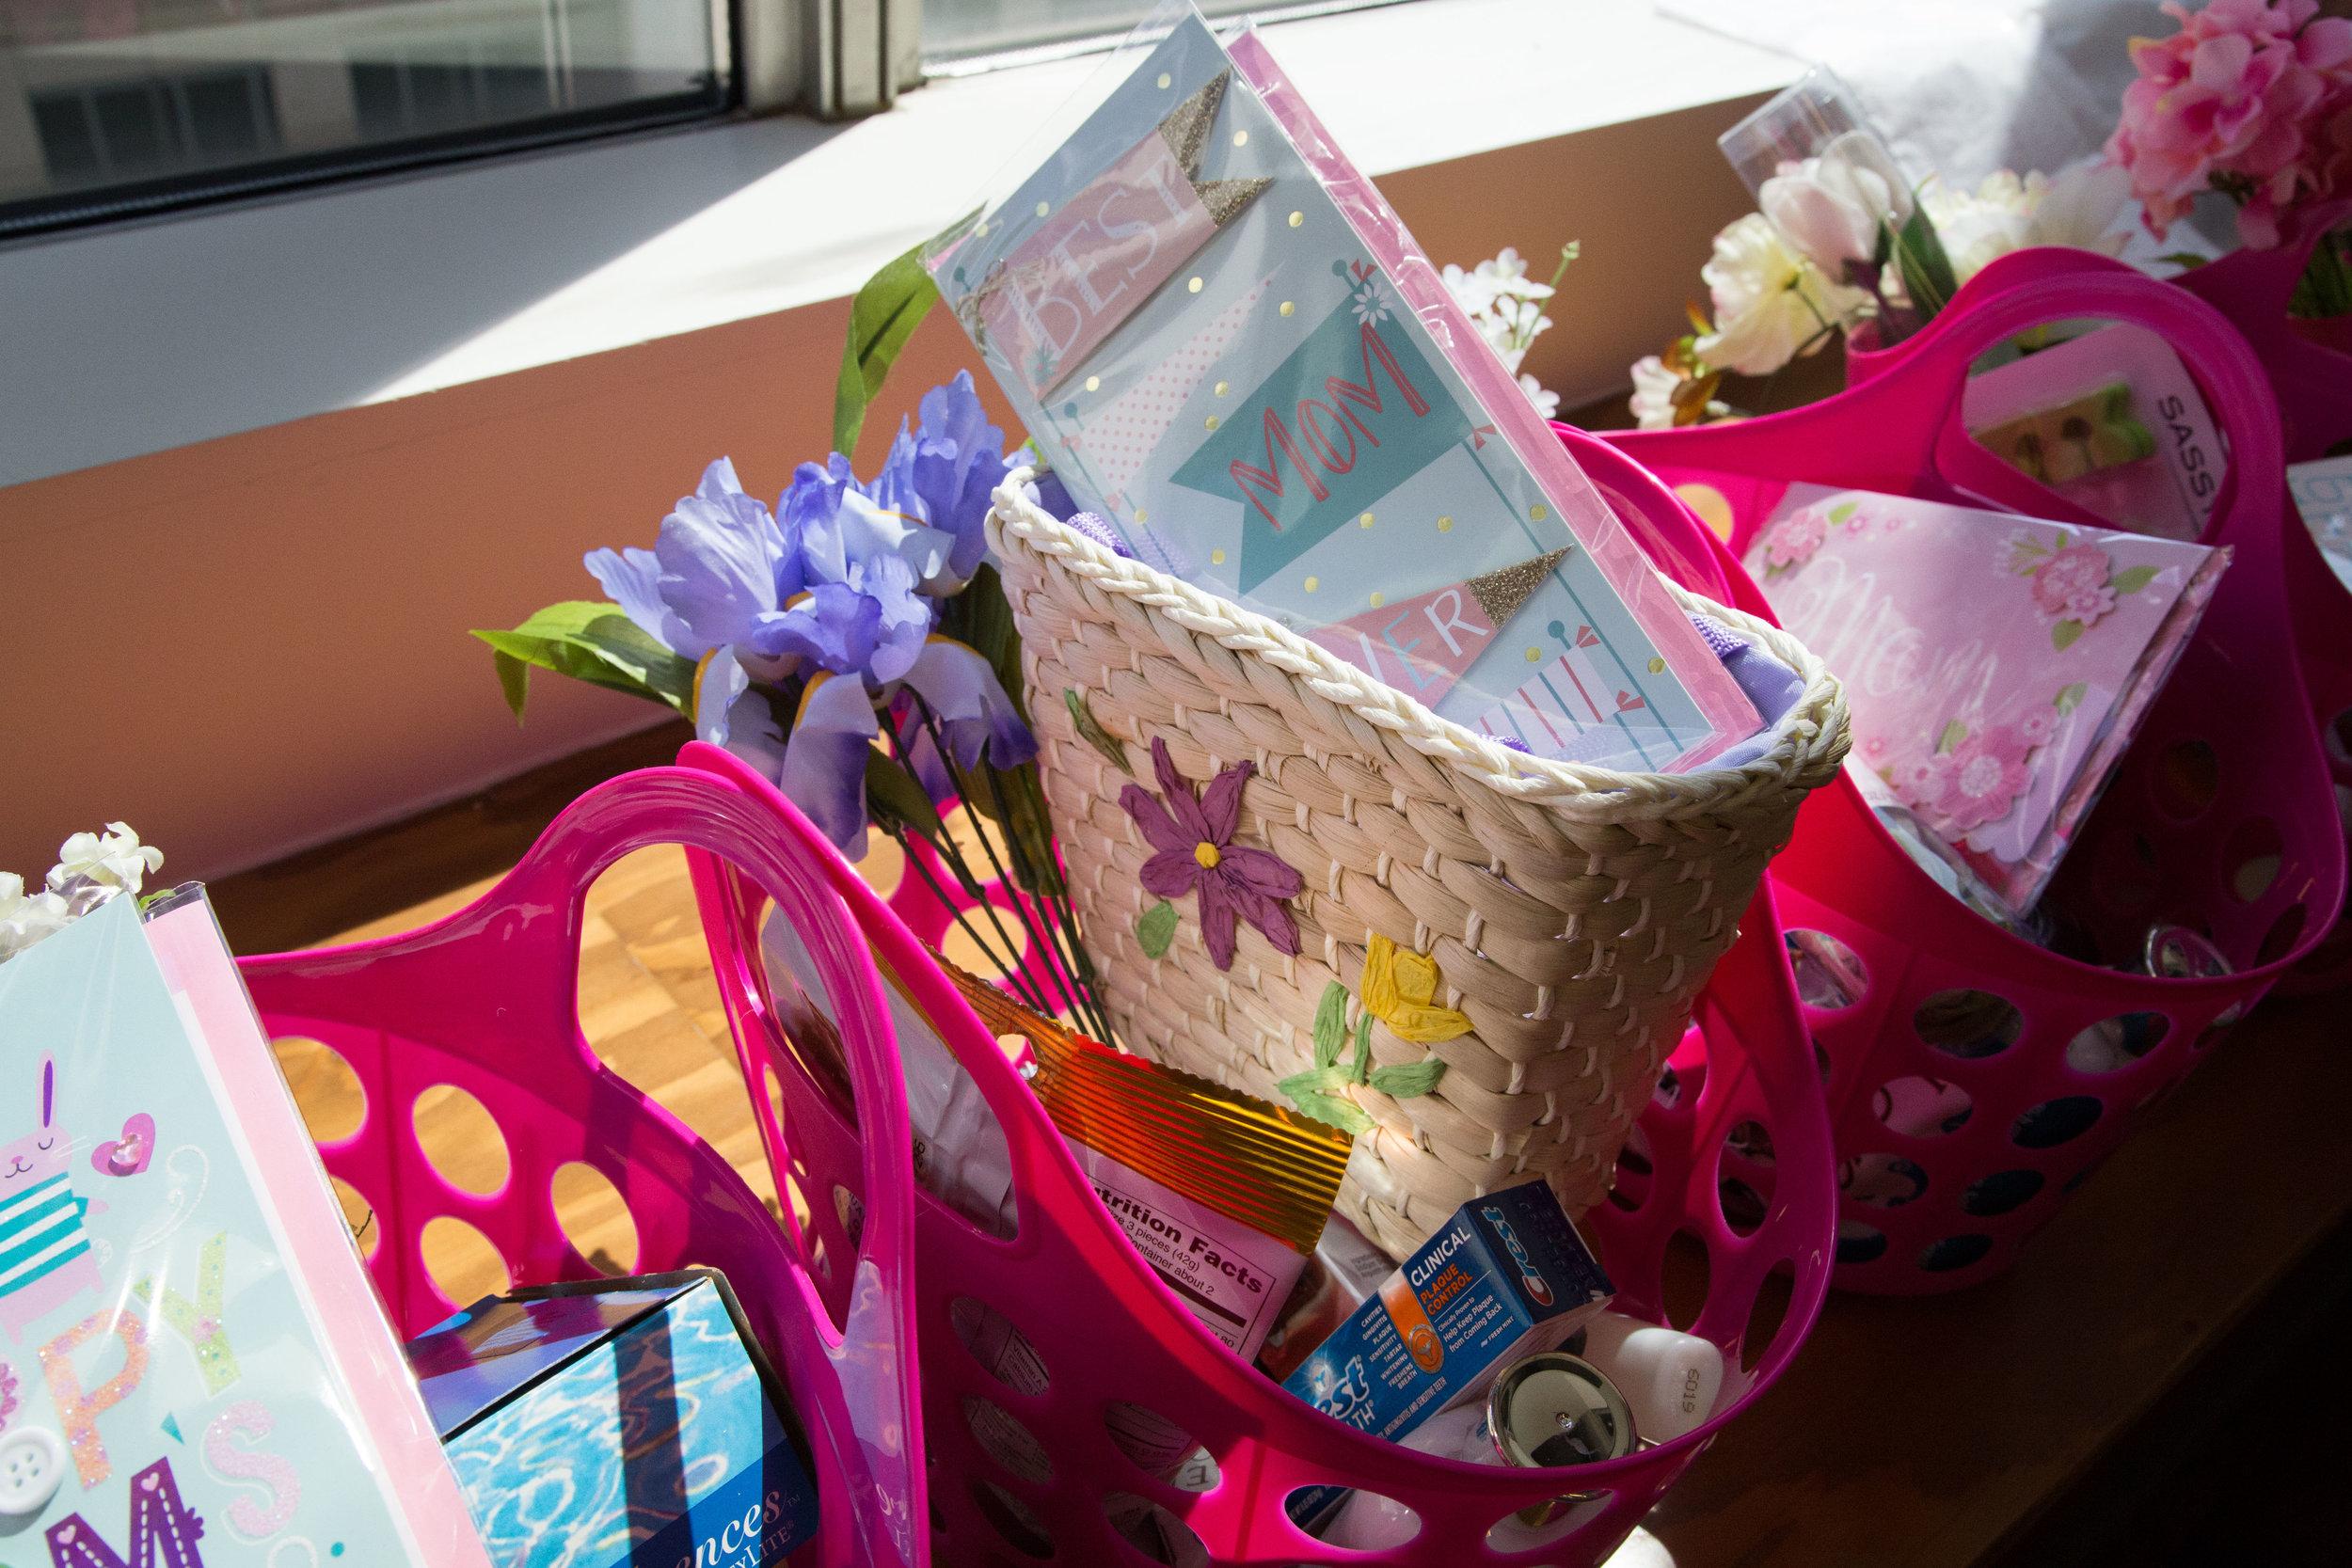 CoughlinPorterLundeen-Mother's-Day-Gift-Baskets-YWCA-2.jpg